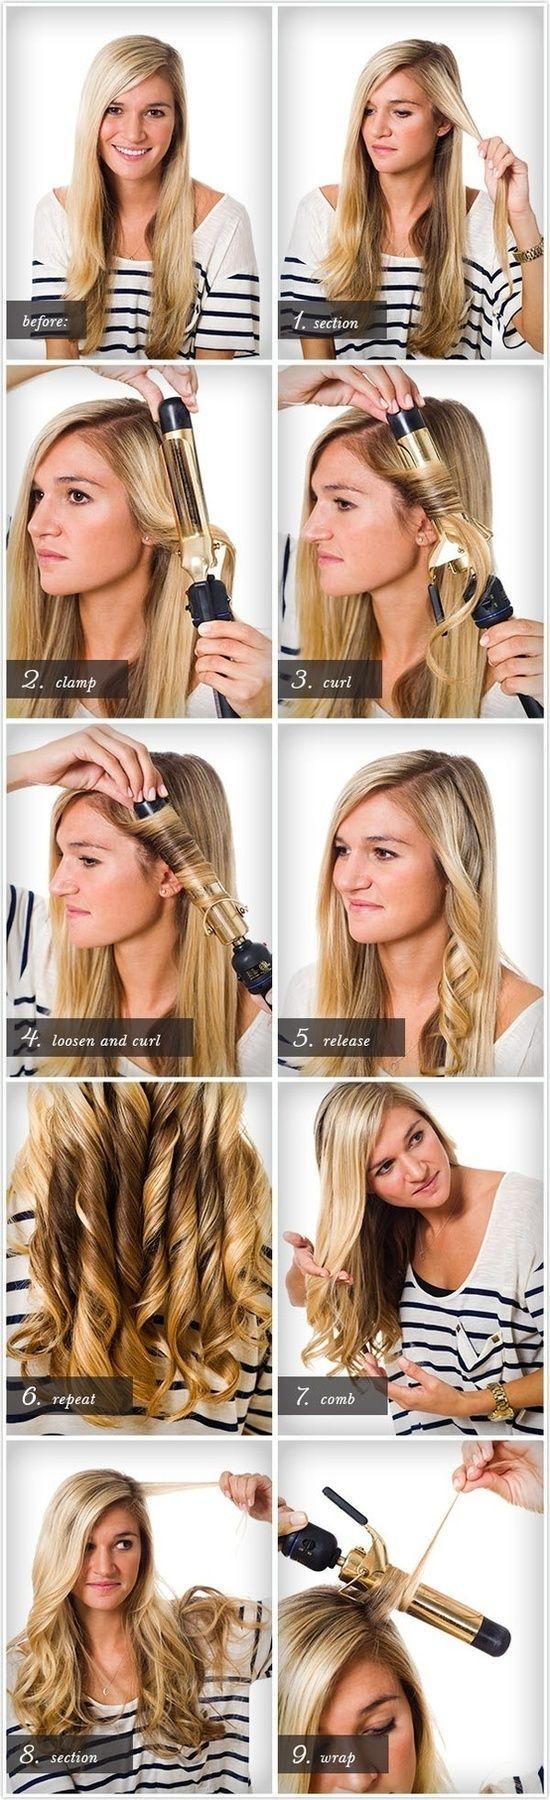 best paul pelo images on pinterest hairstyle ideas tuto